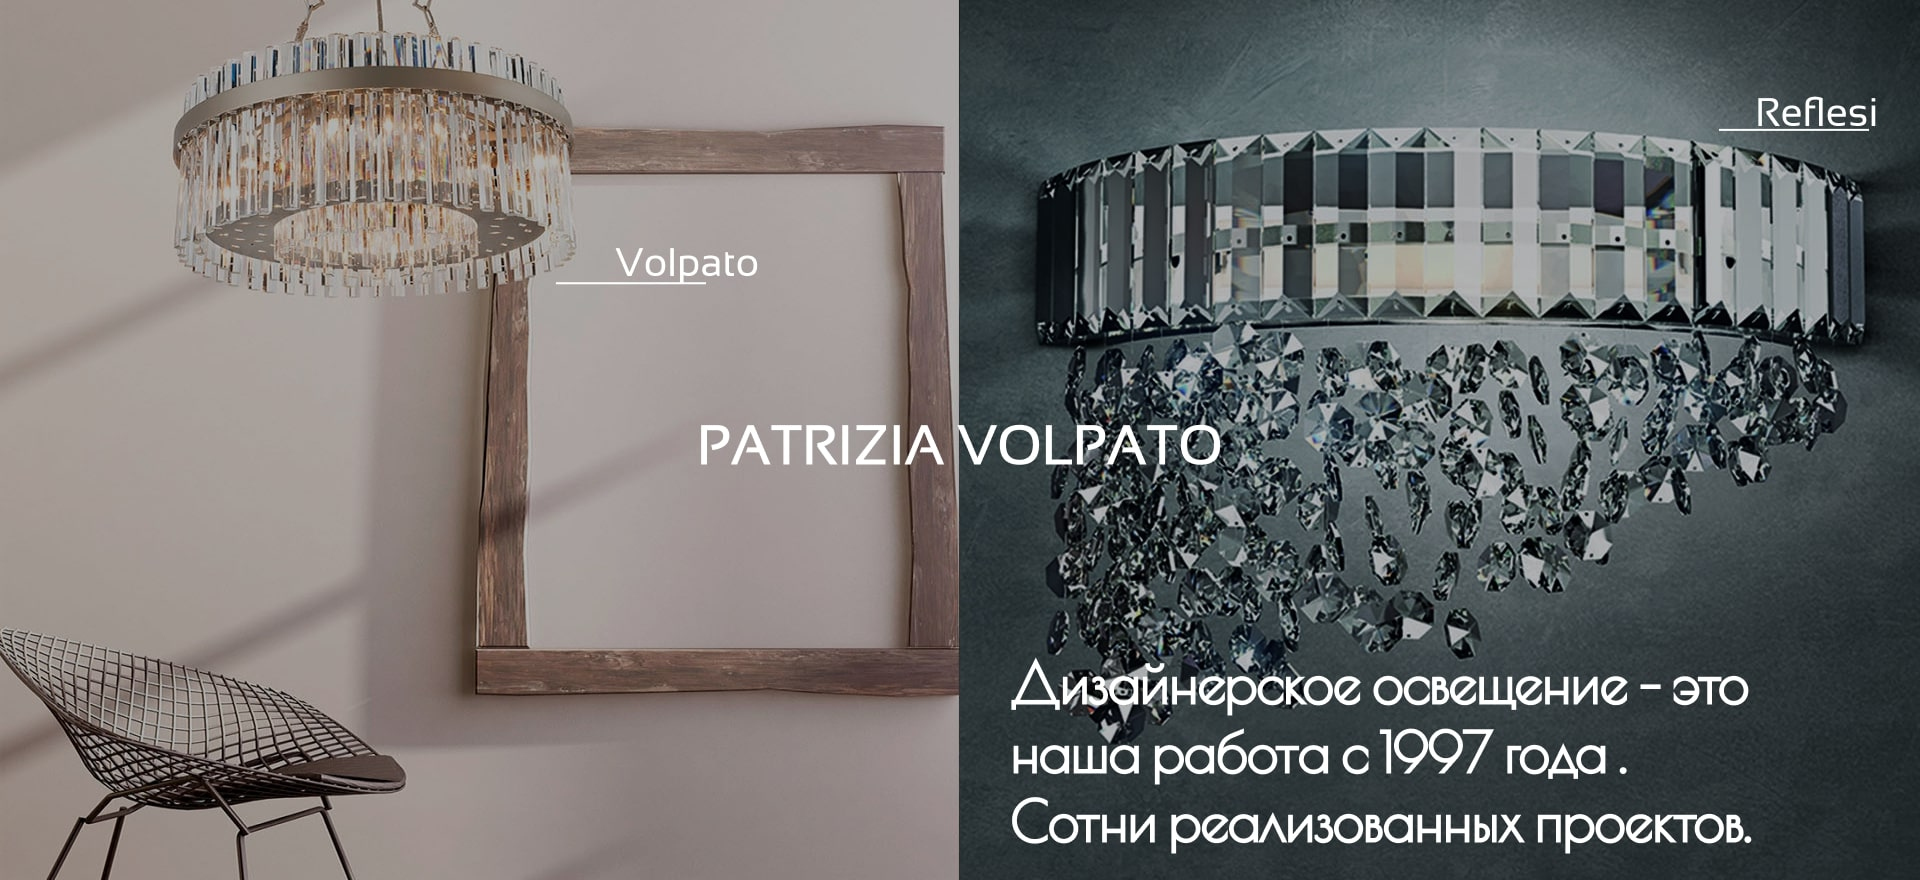 slider-patrizia-volpato